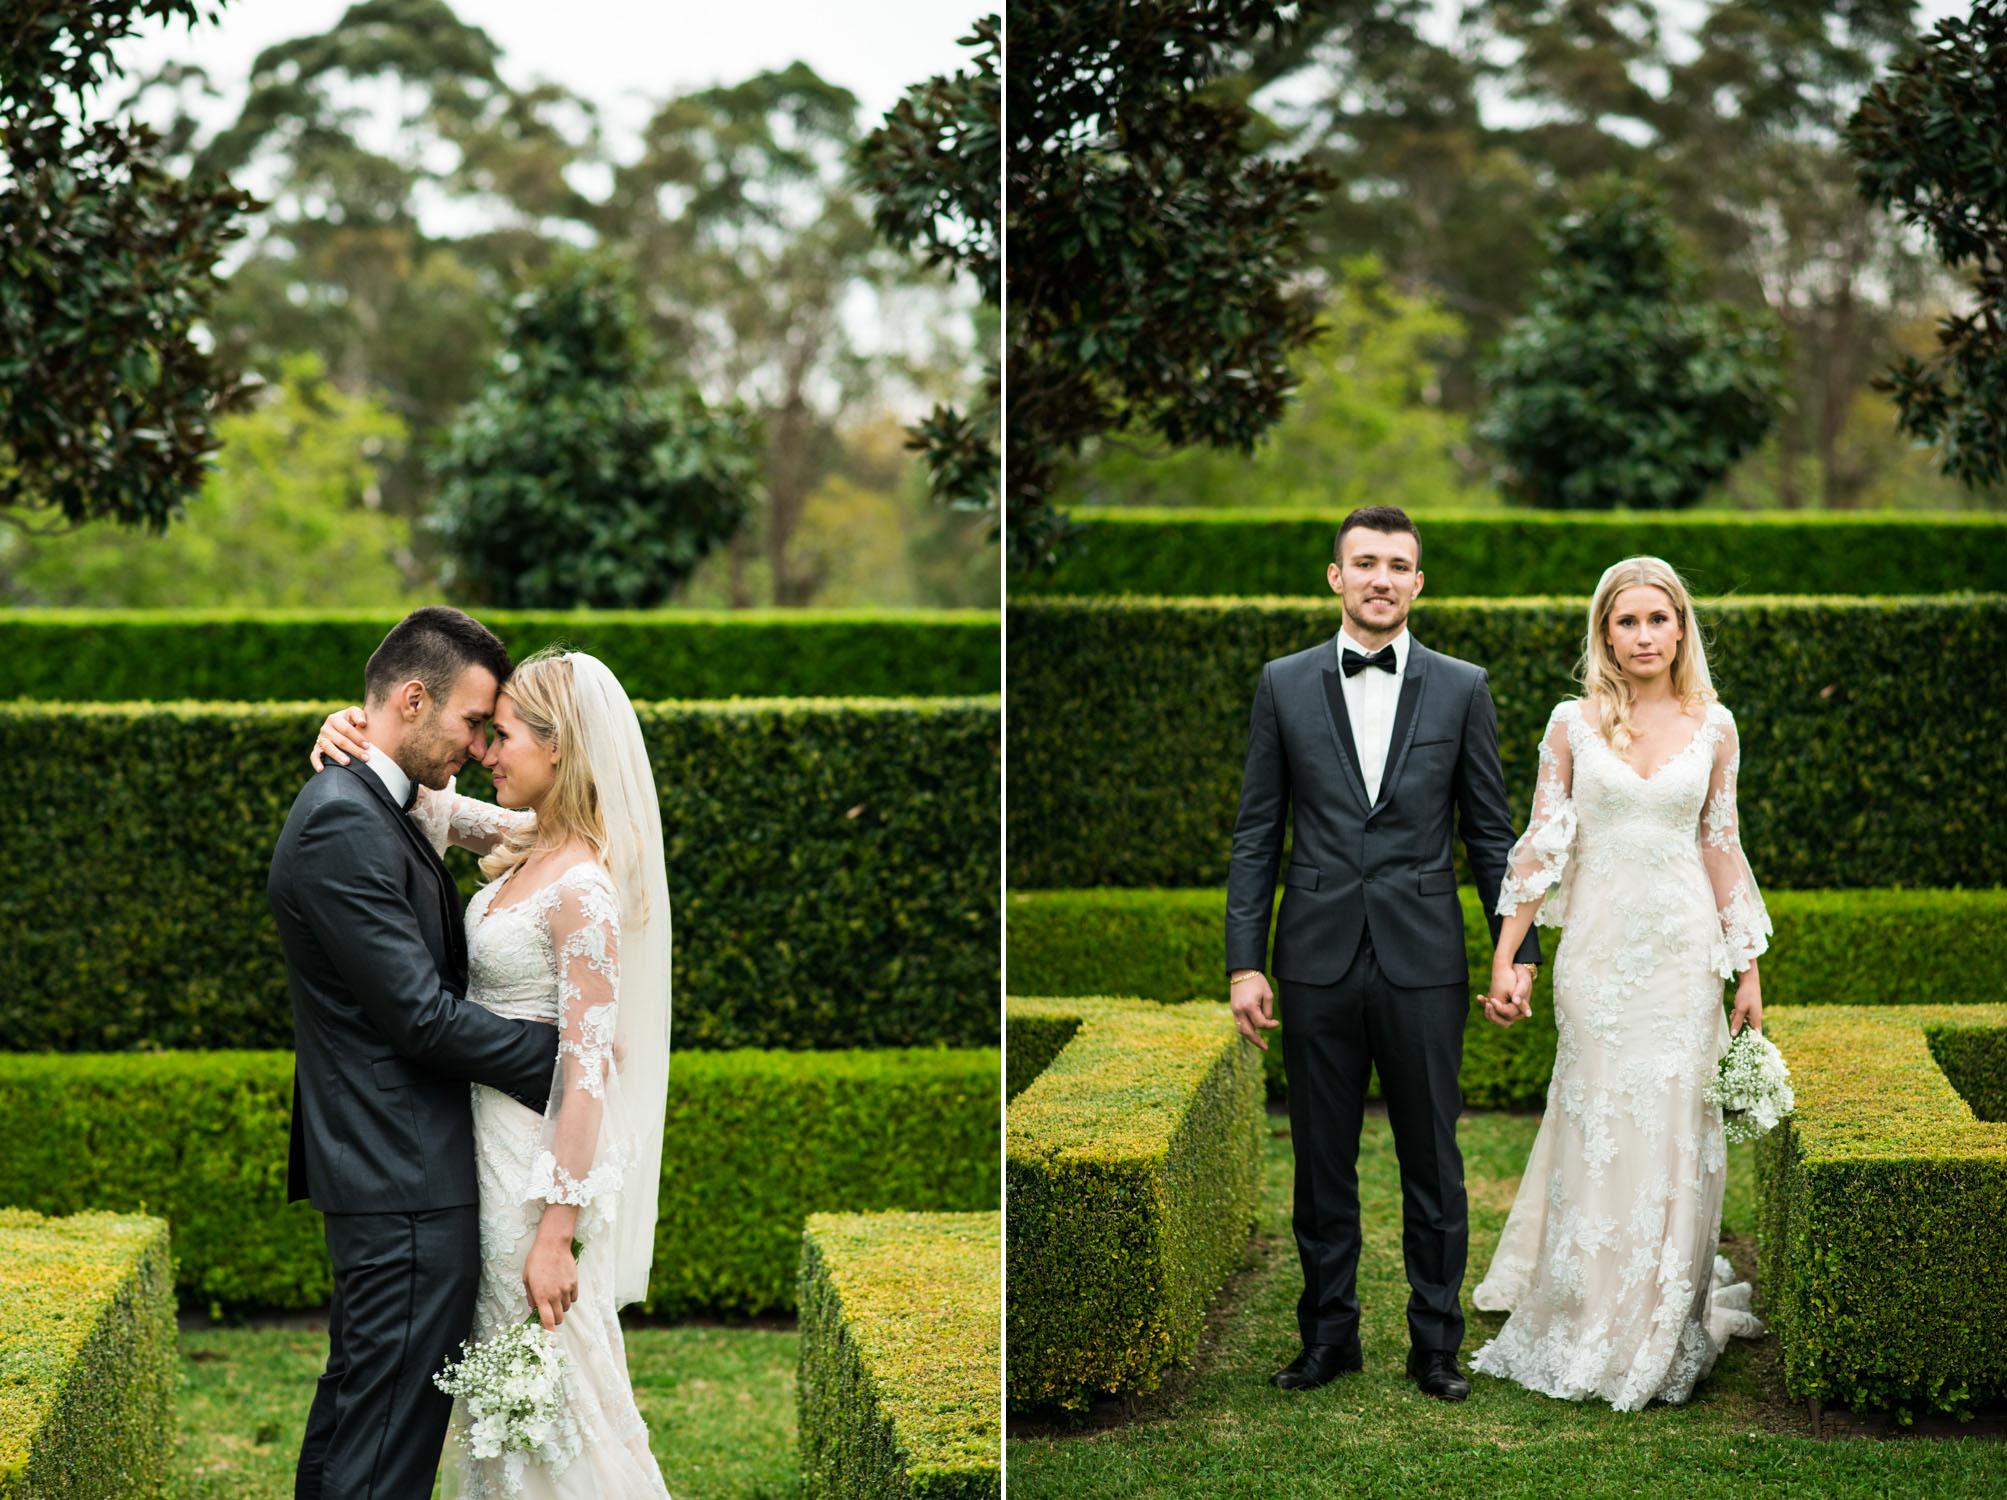 Christina and Marko wedding LR-1568 copy.jpg